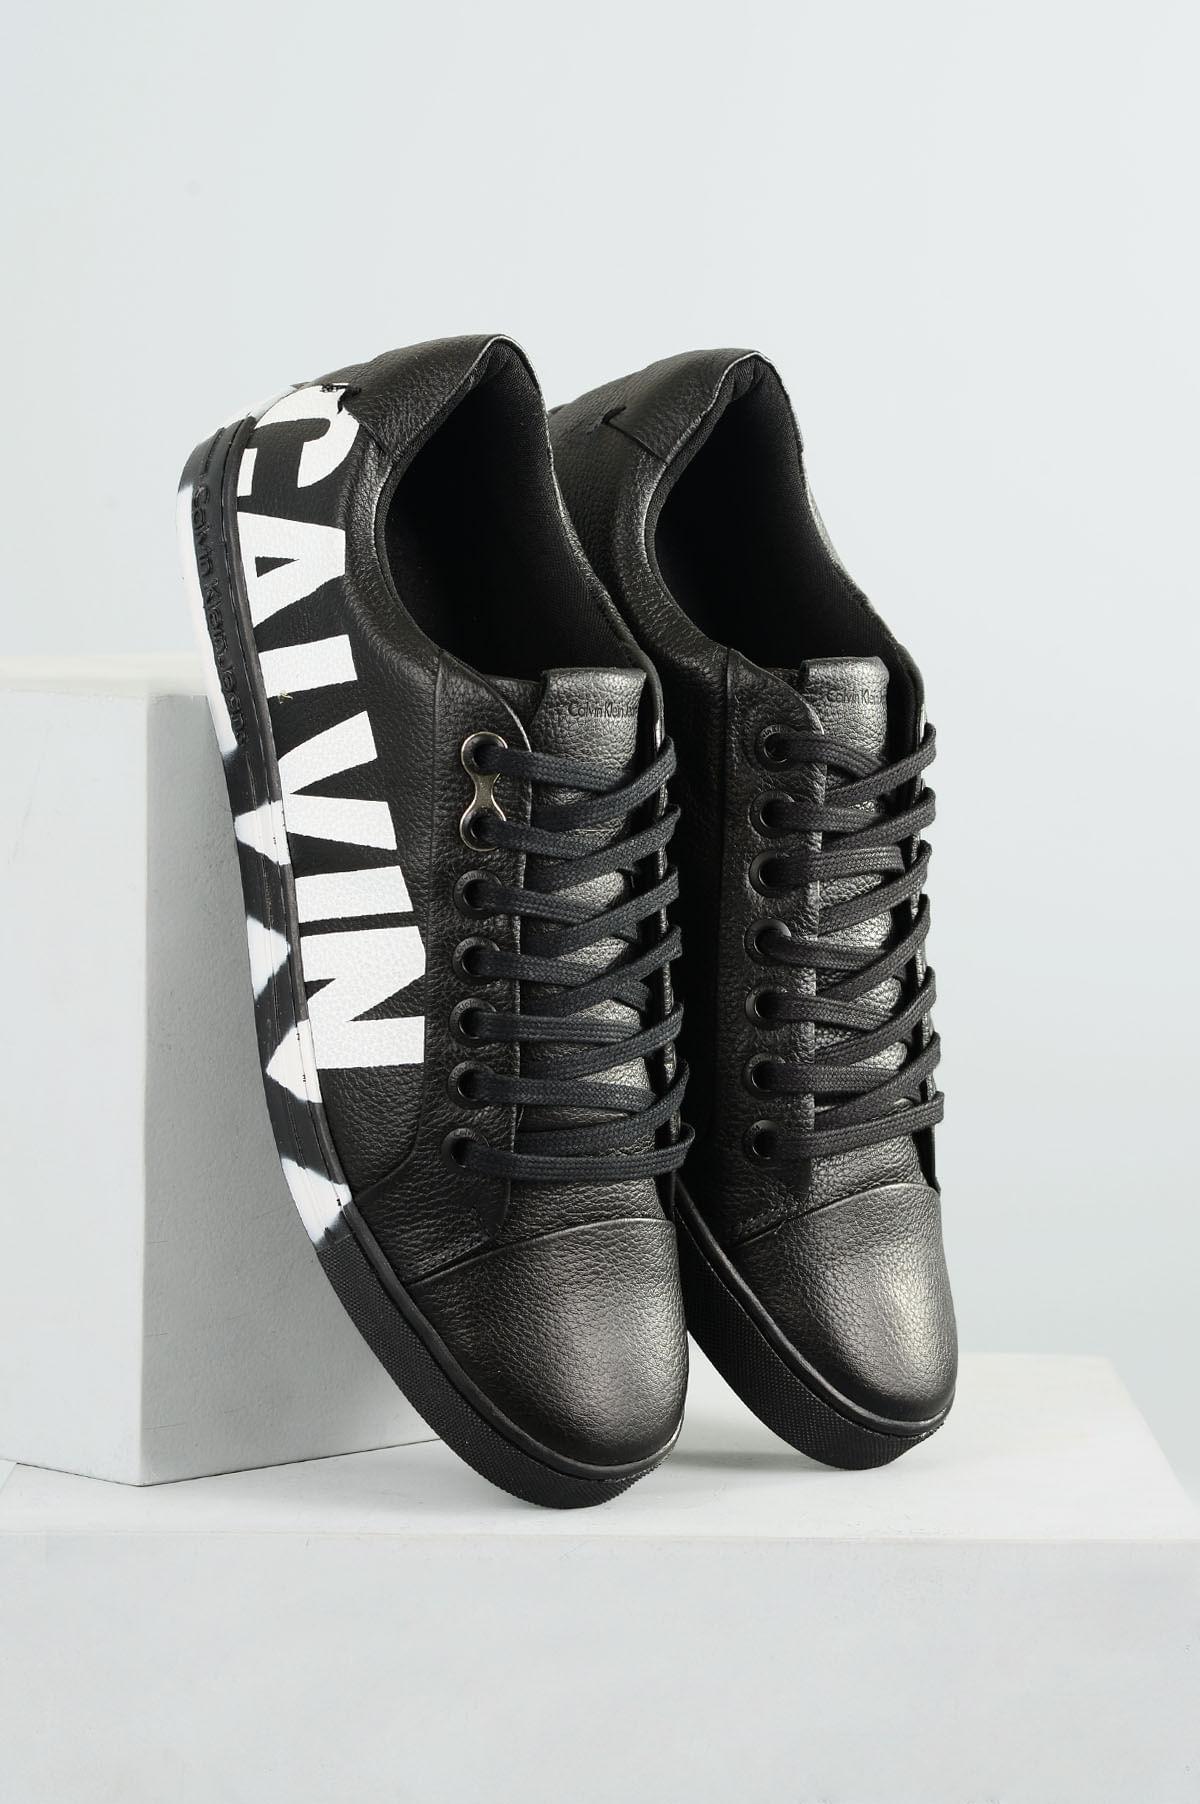 f4639bcf6683c Sapatênis Masculino Calvin Klein Pedro CR-PRETO - Mundial Calçados